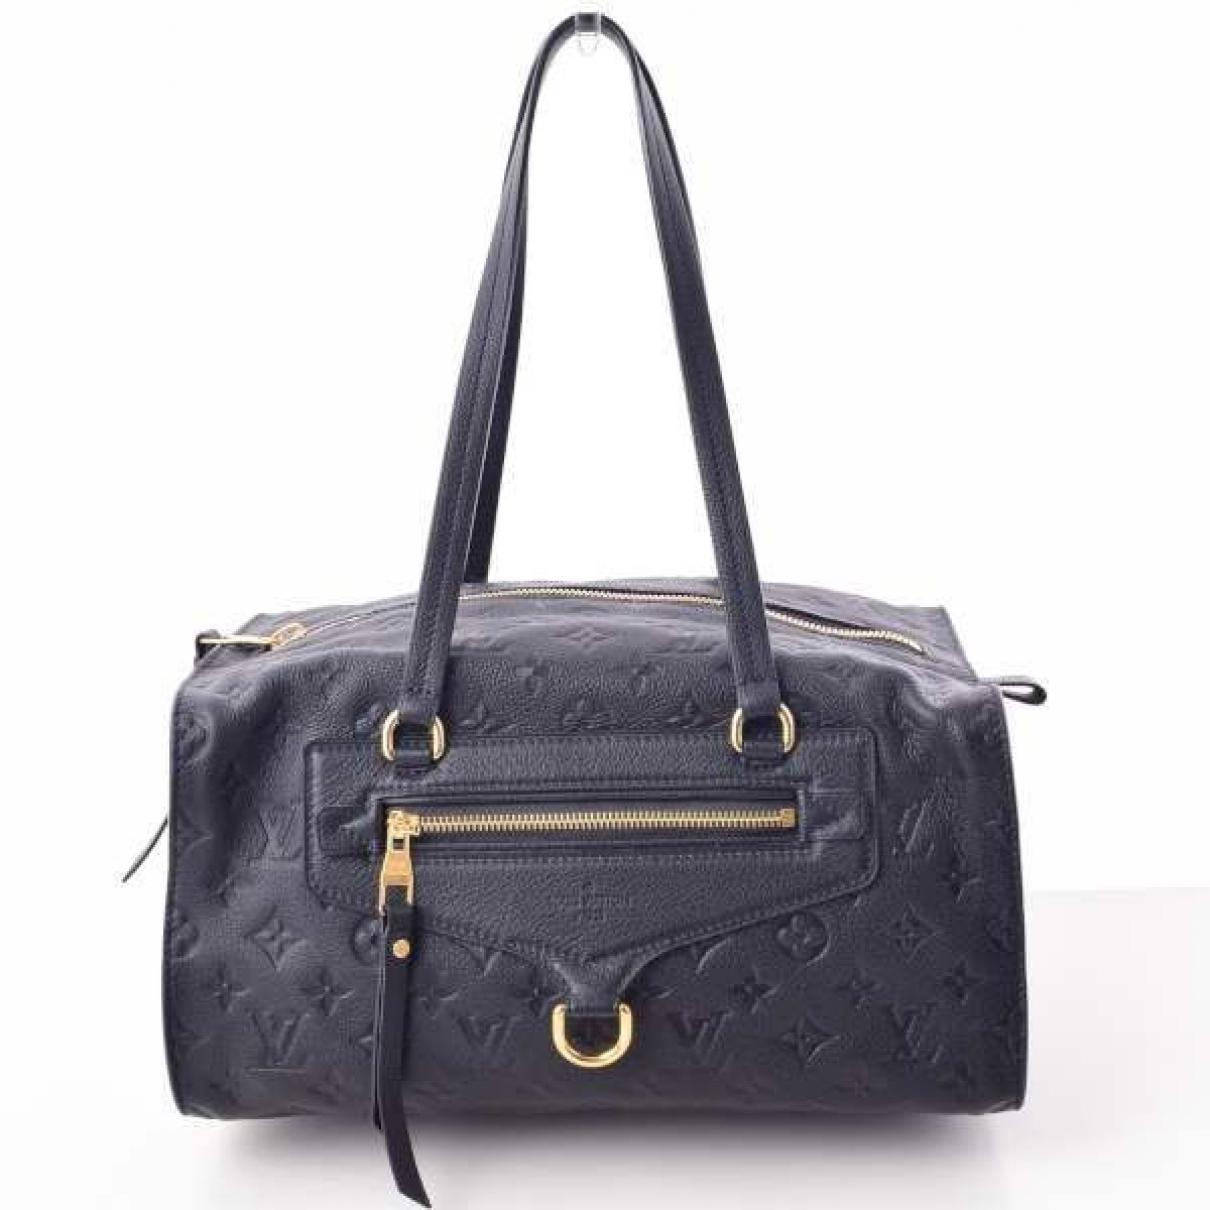 Louis Vuitton \N Navy Leather handbag for Women \N